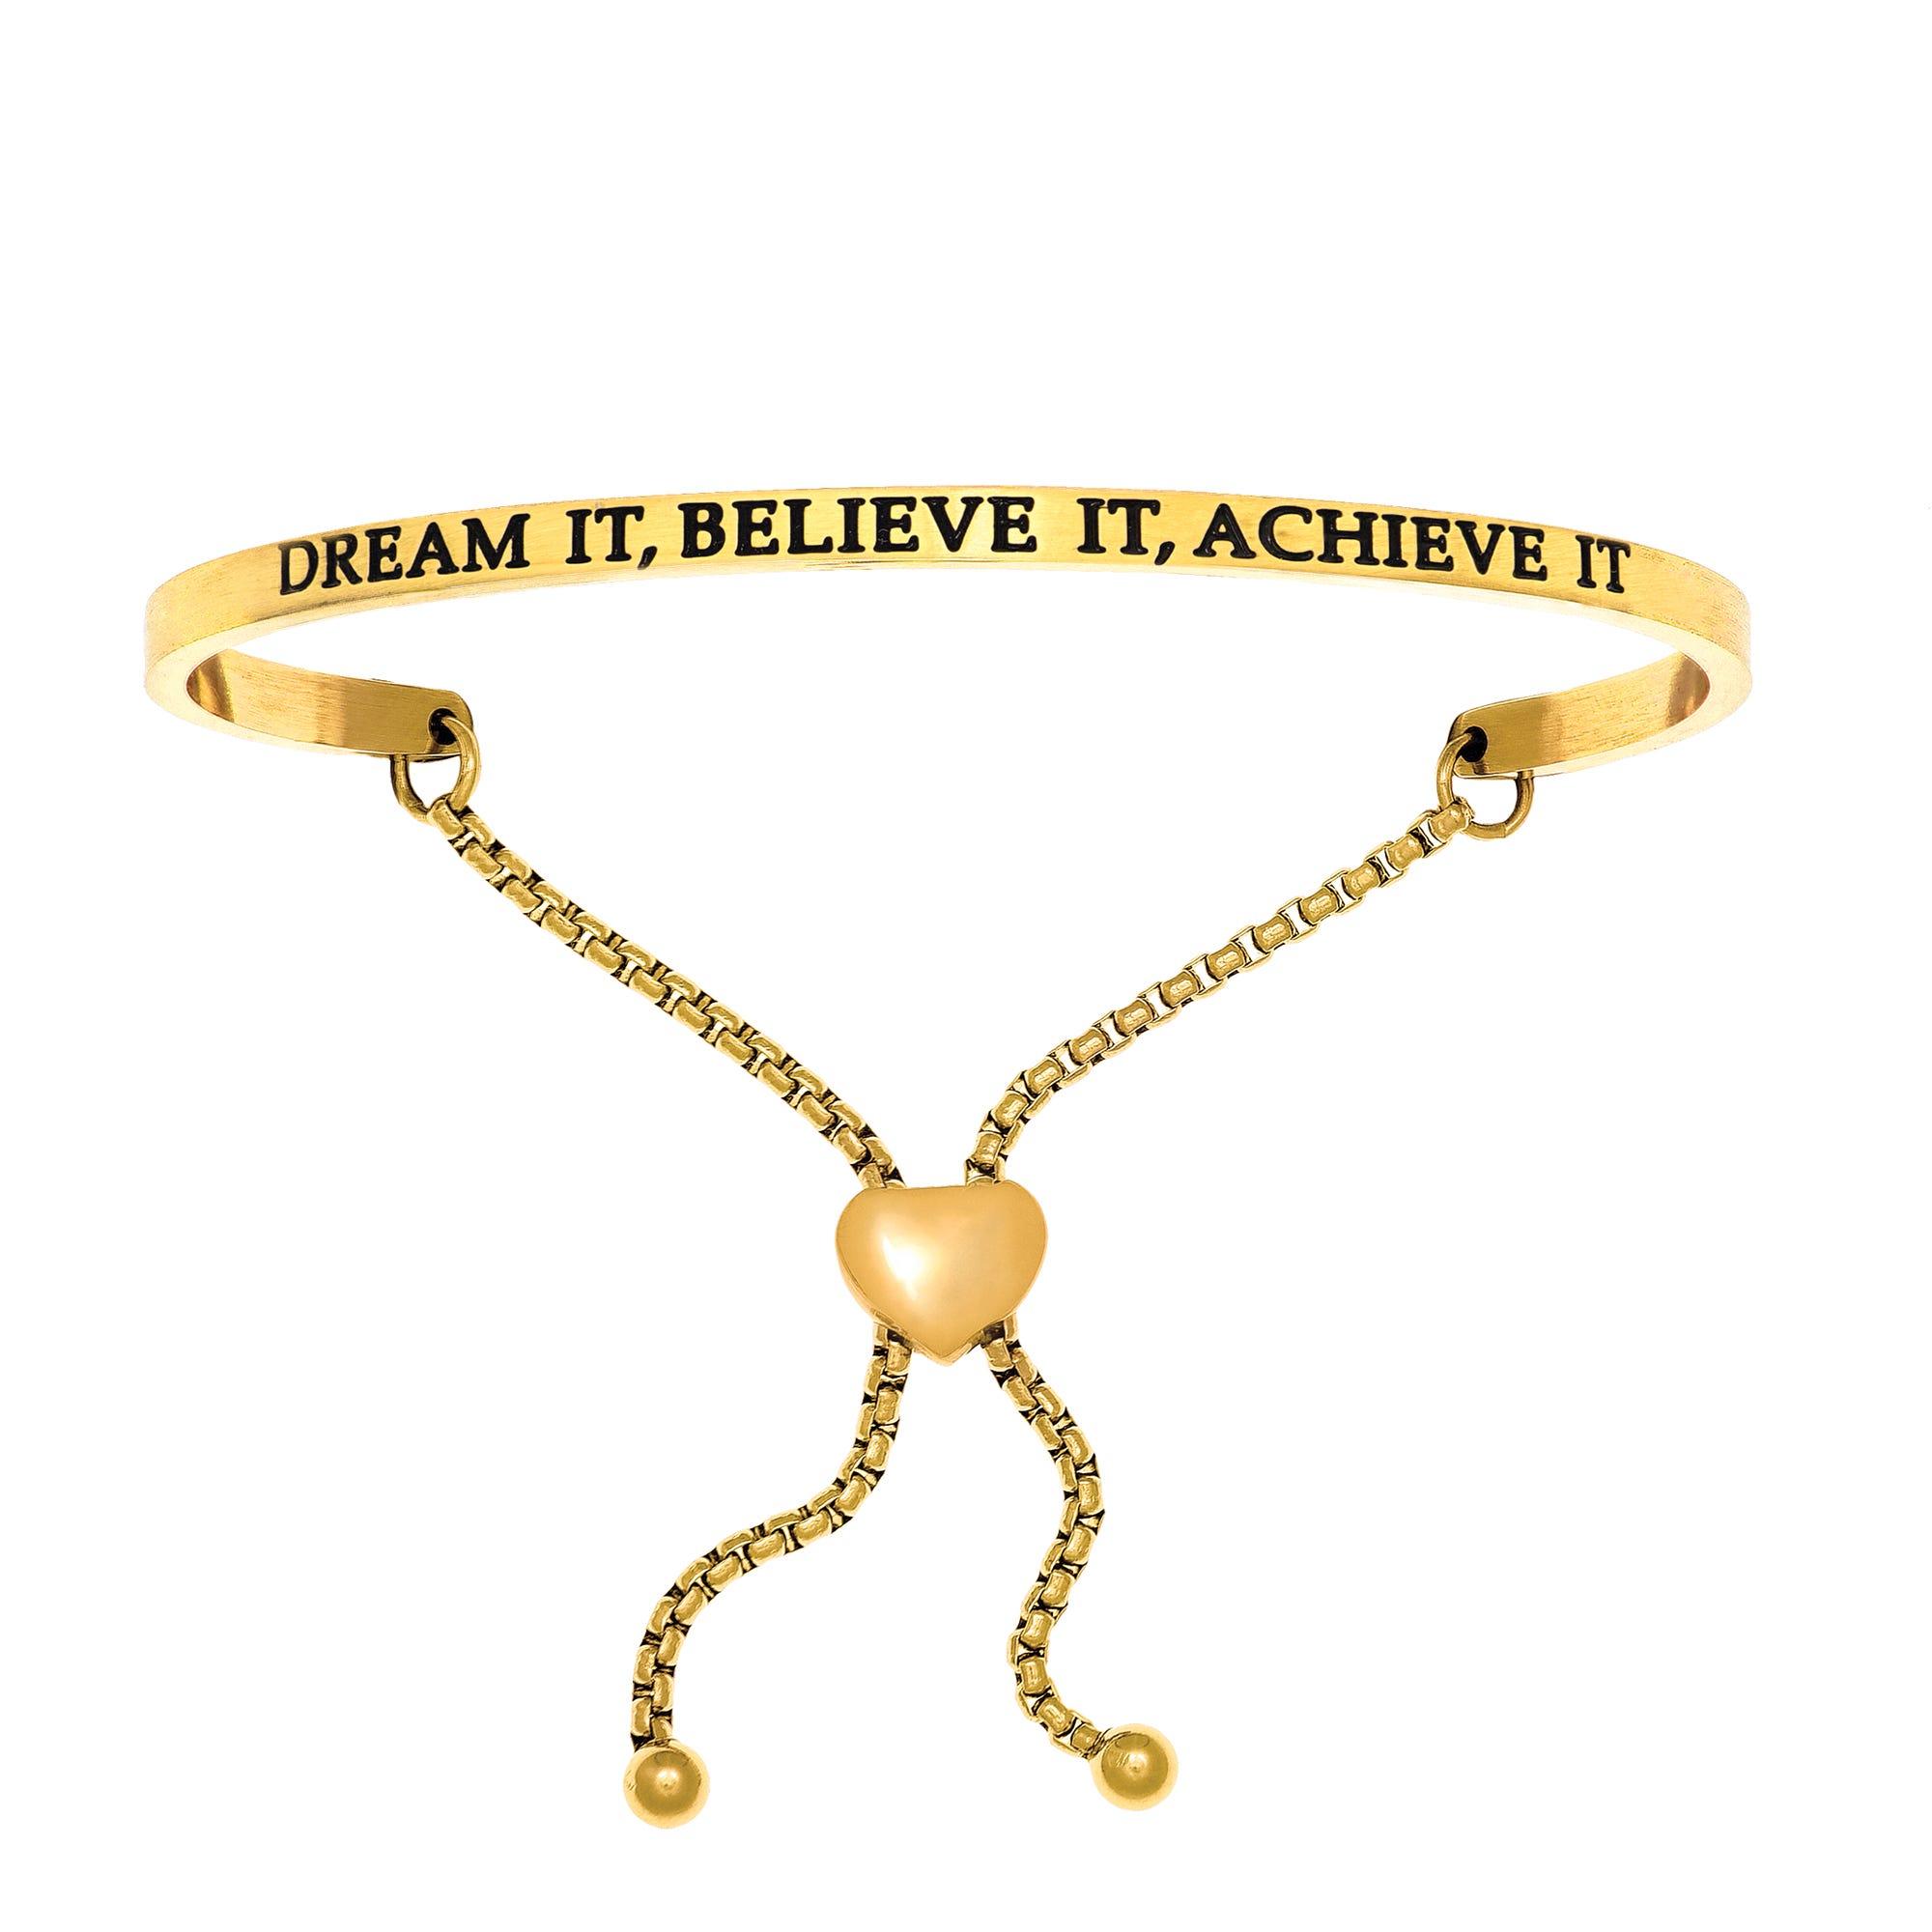 Dream It Believe It Achieve It. Intuitions Bolo Bracelet in Yellow Stainless Steel